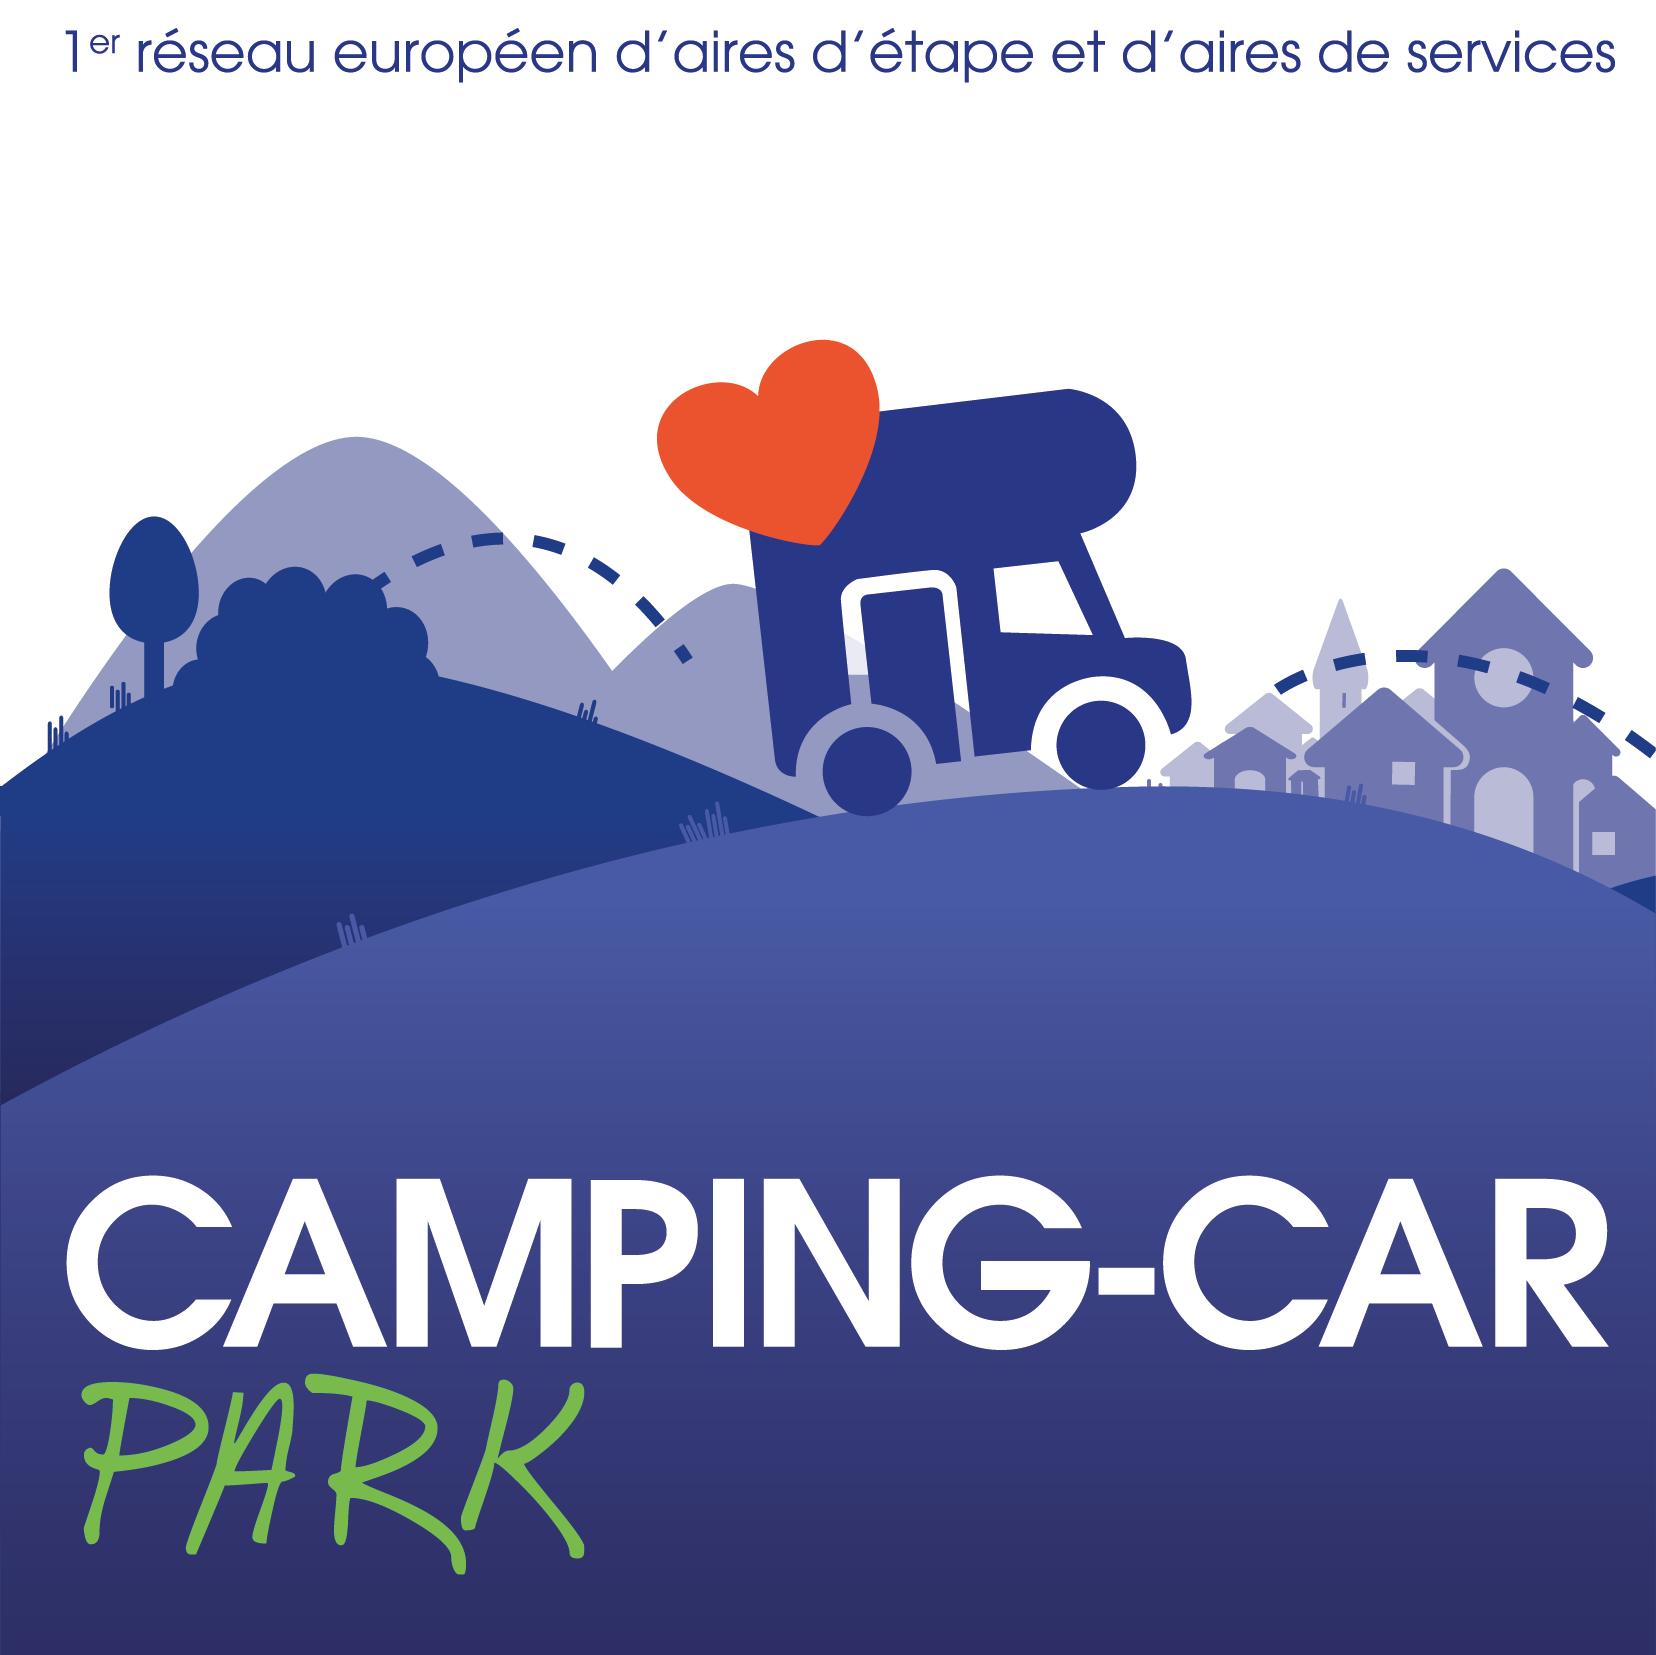 Autocollant CAMPING-CAR PARK